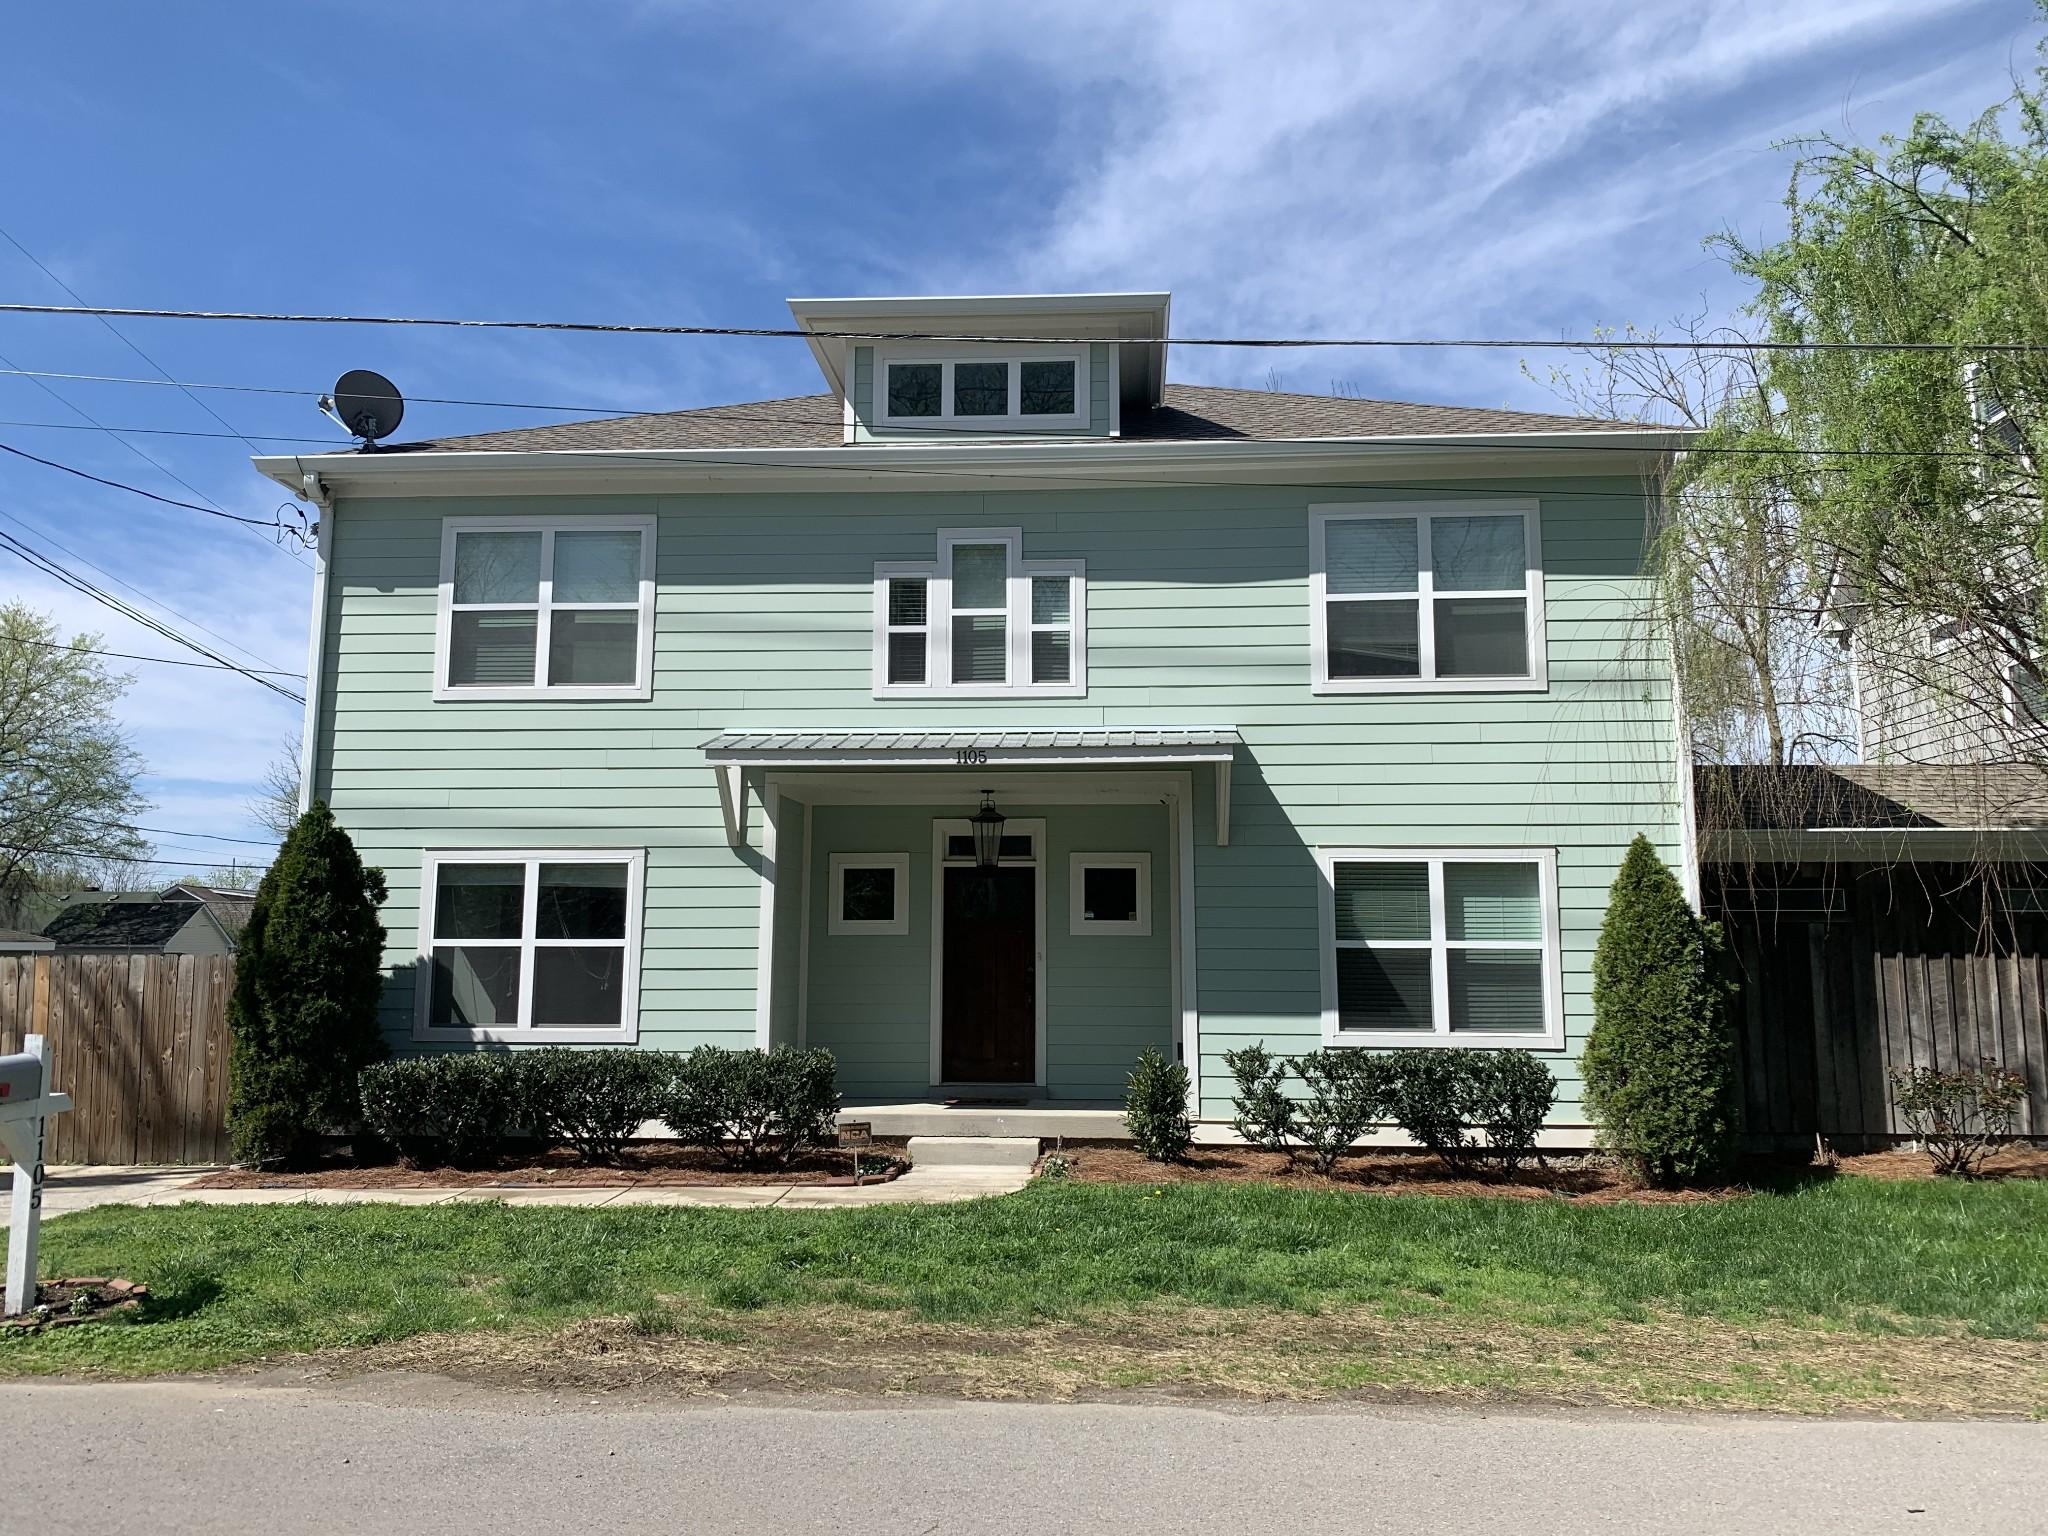 1105 49th Ave, N, Nashville, TN 37209 - Nashville, TN real estate listing